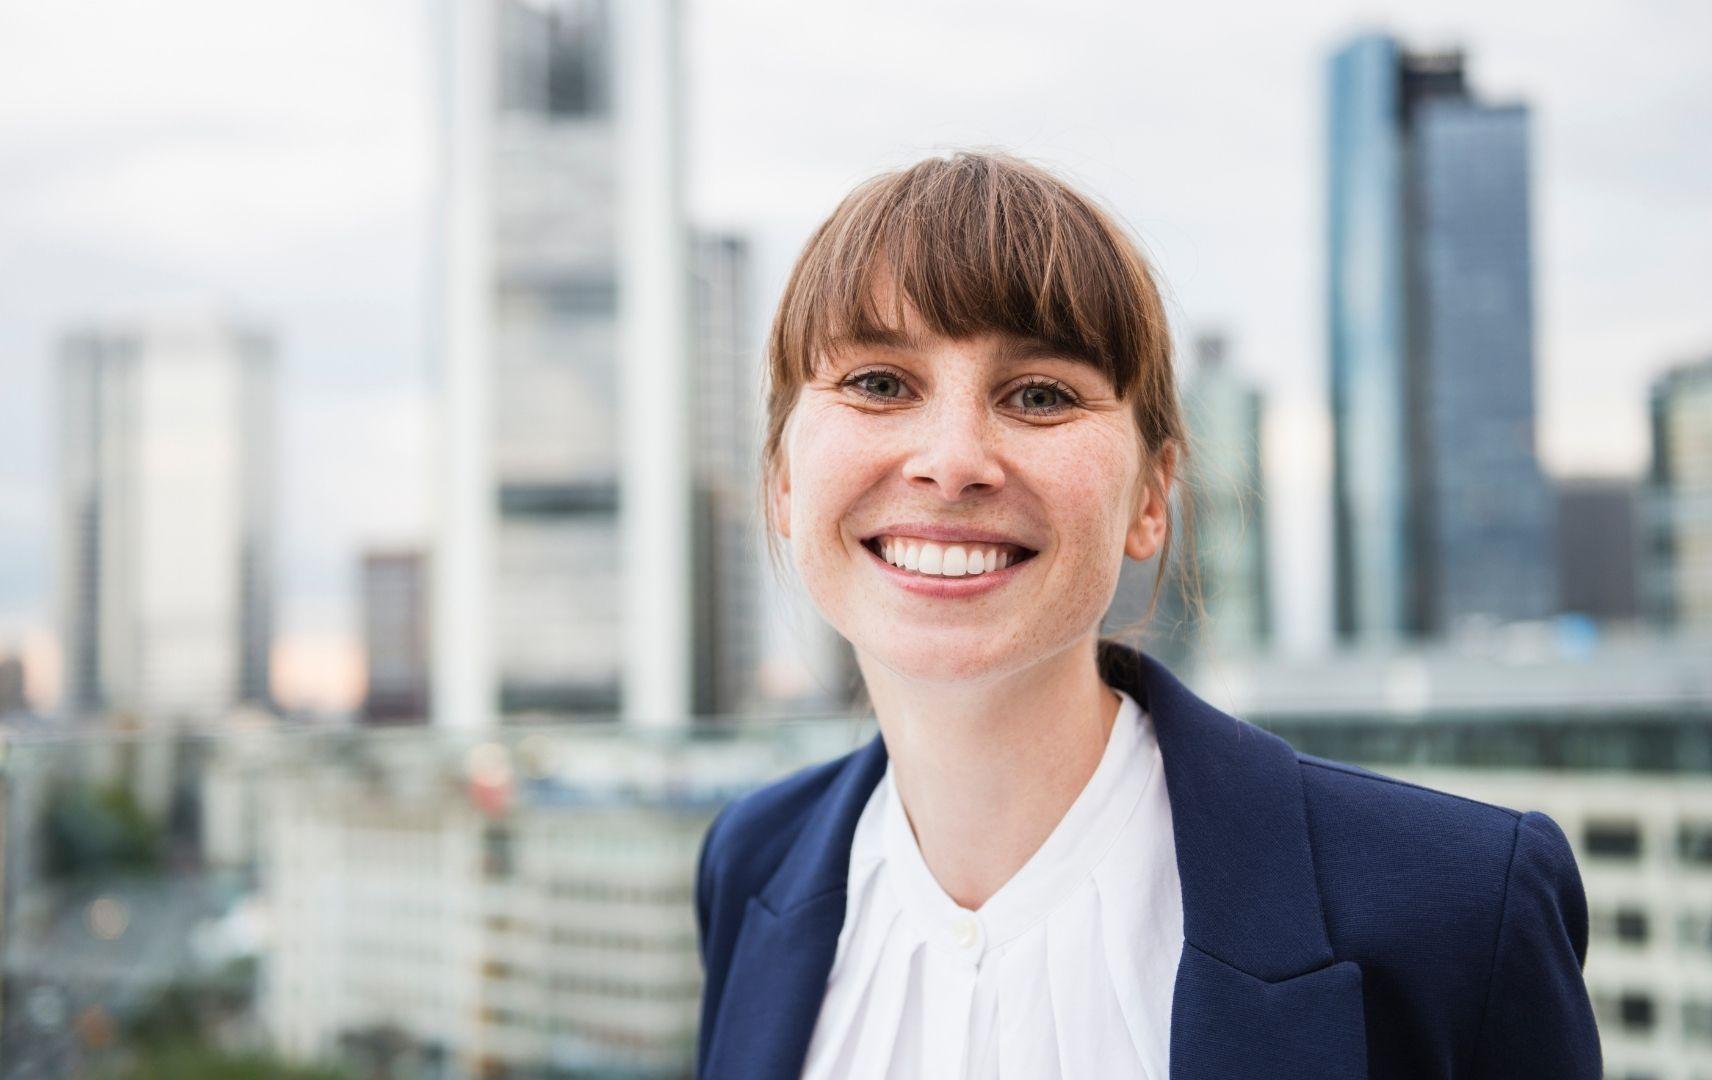 Junge Businessfrau lachend vor Frankfurter Skyline